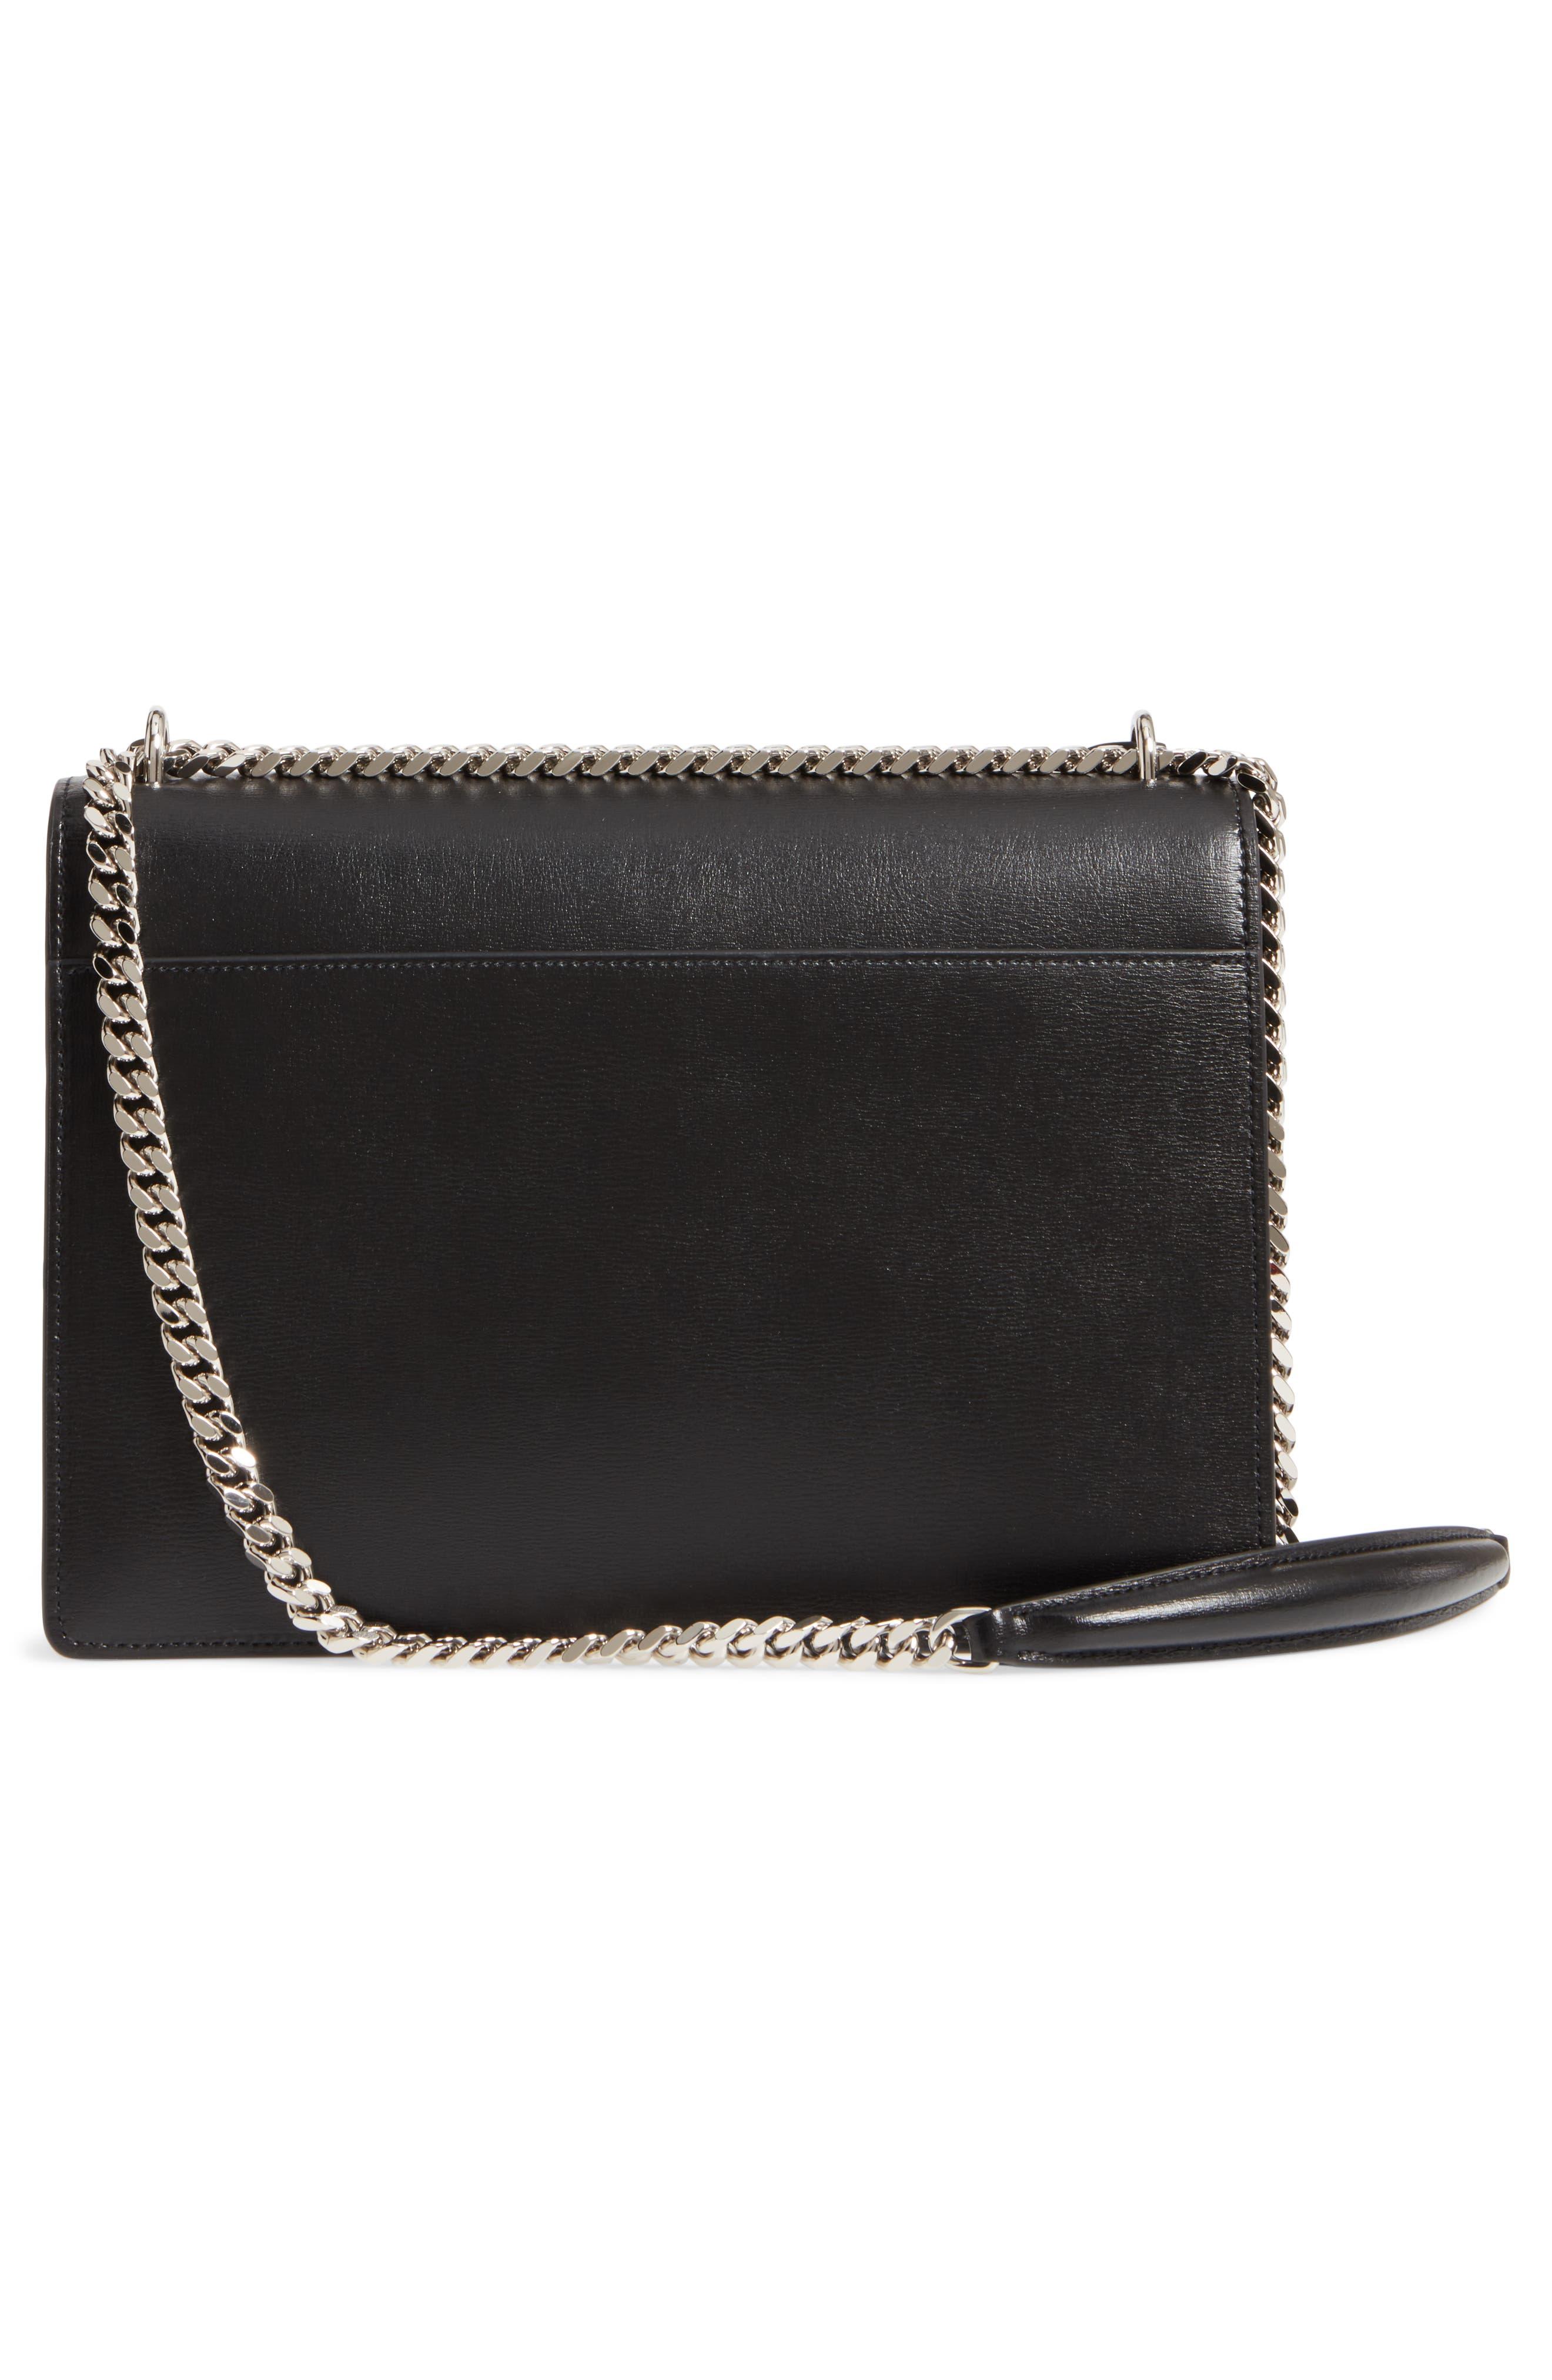 Medium Sunset Leather Shoulder Bag,                             Alternate thumbnail 3, color,                             NOIR